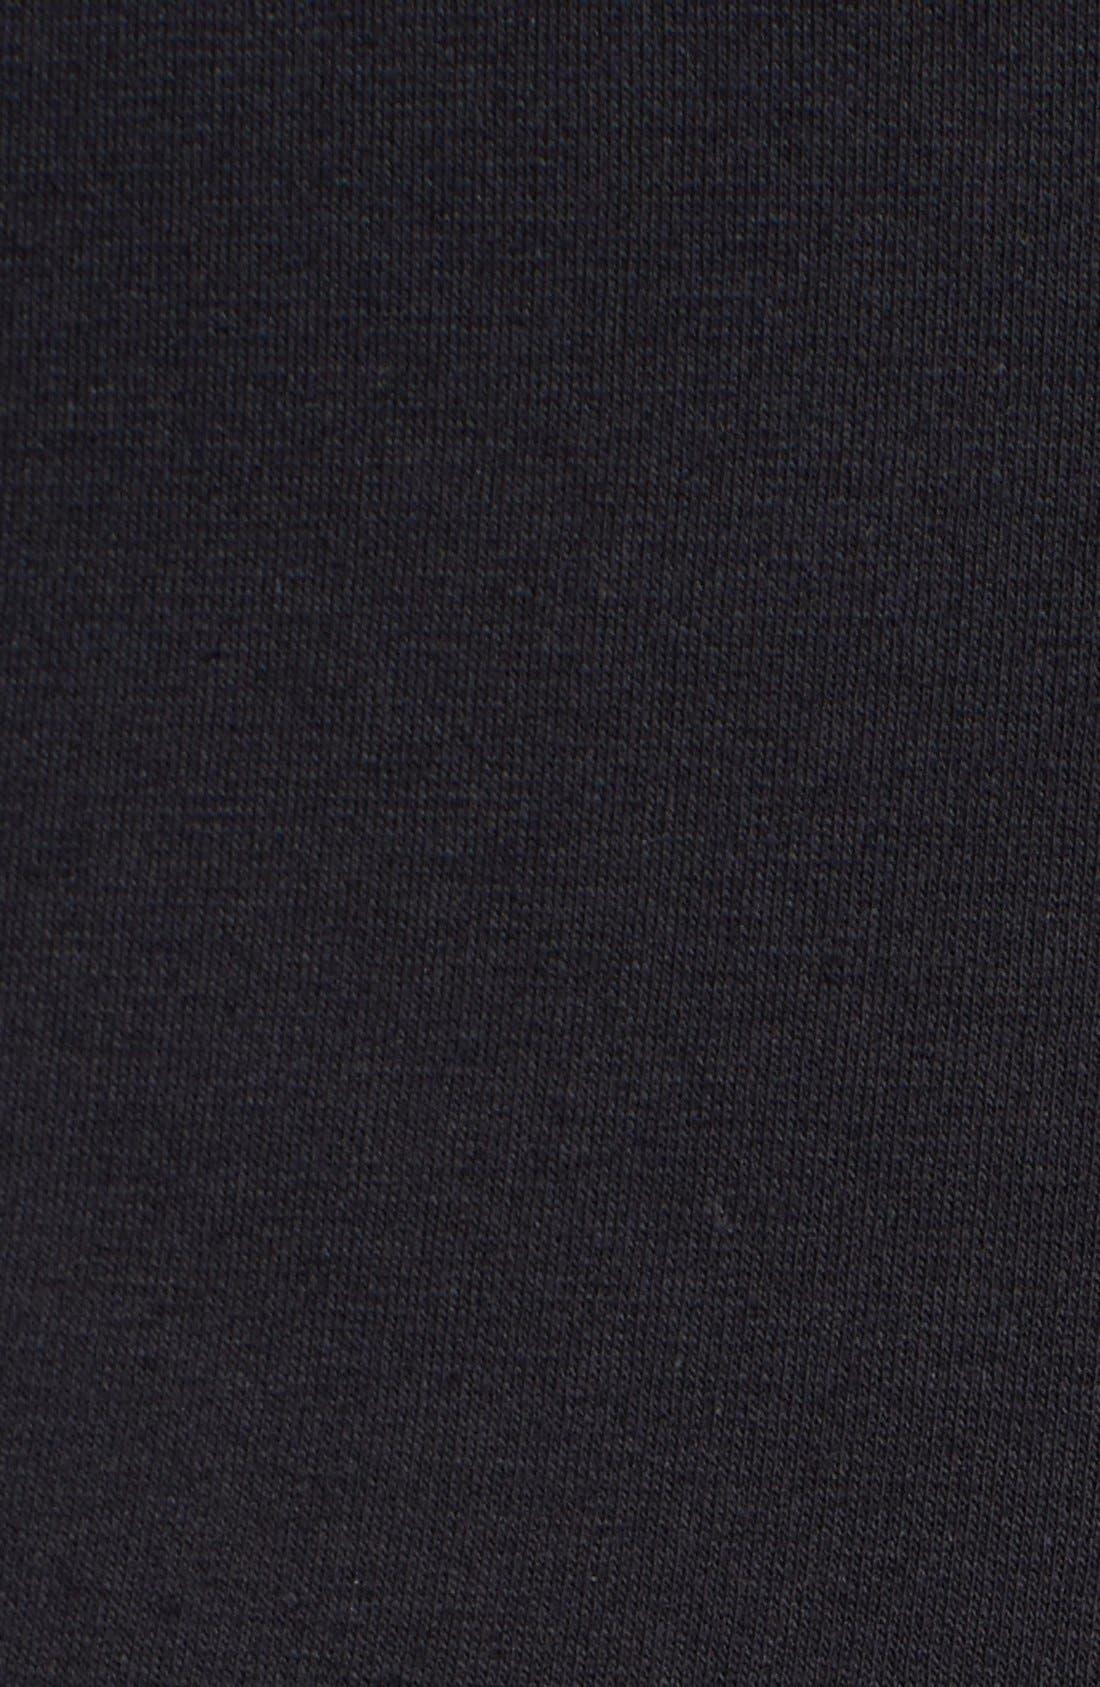 Knit Unconstructed Blazer,                             Alternate thumbnail 5, color,